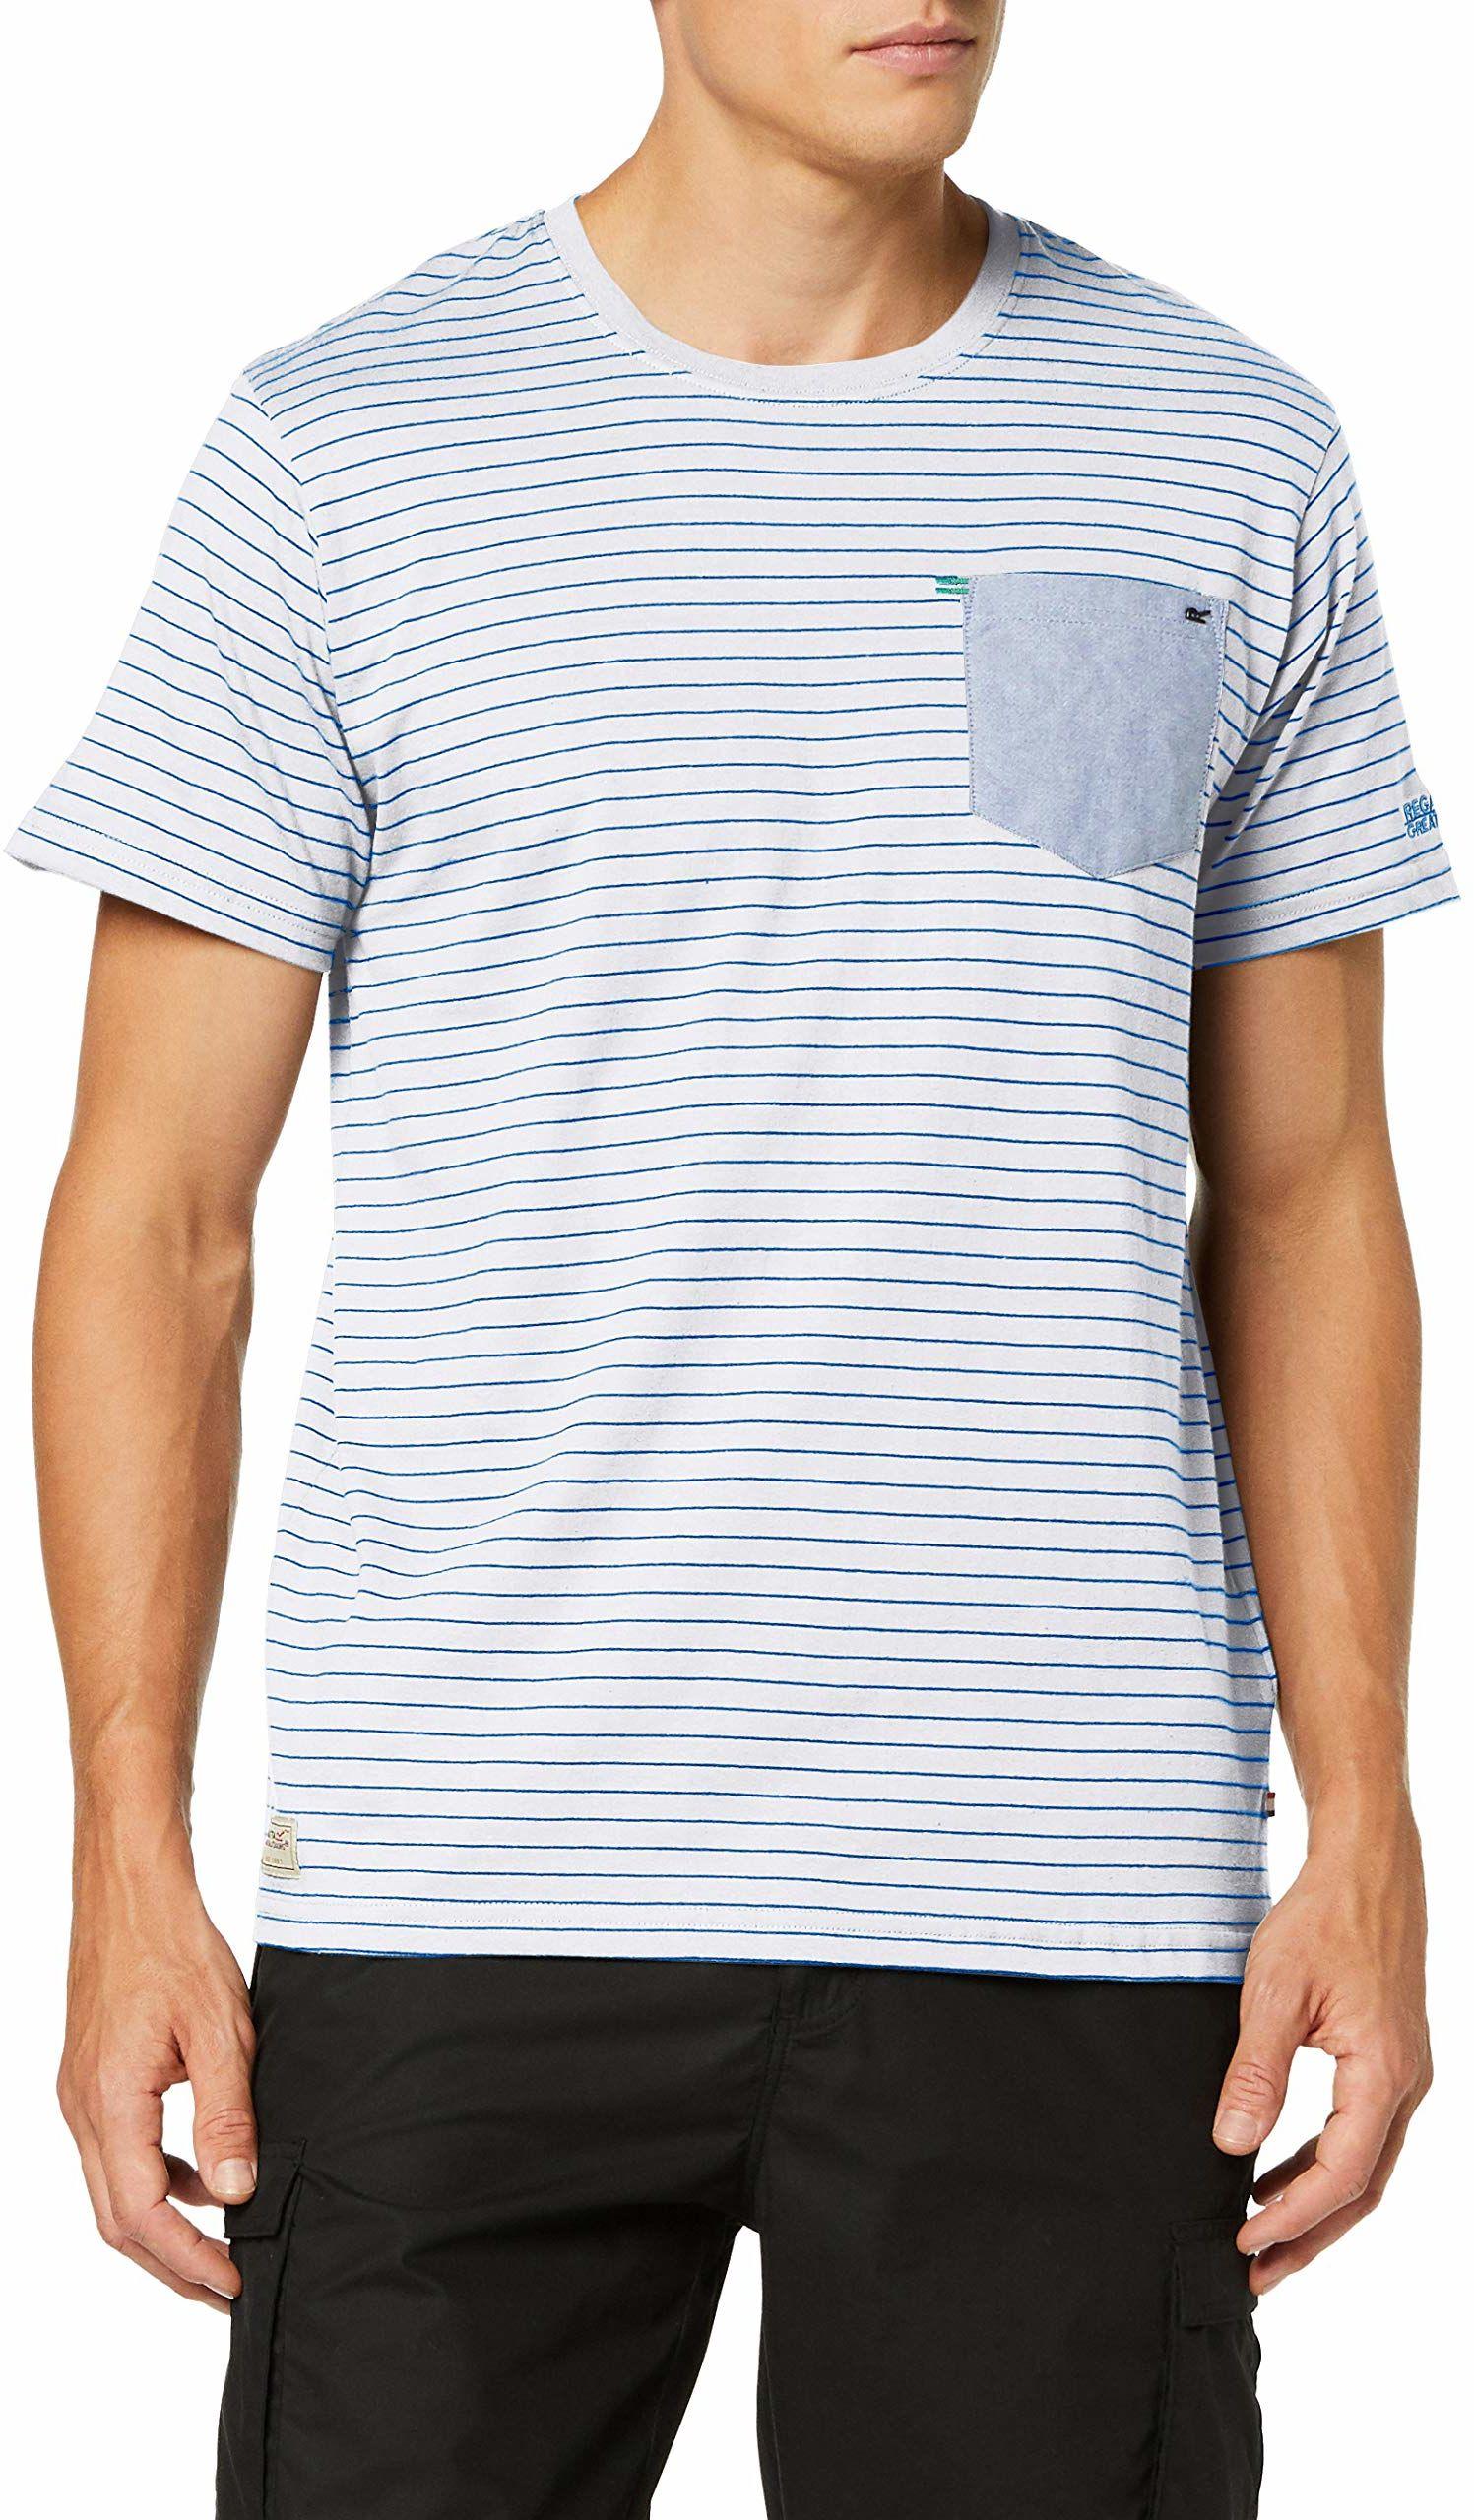 Regatta męska koszulka teagan Coolweave paski piersiowa kieszeń T-shirt White/Oxford Blue L